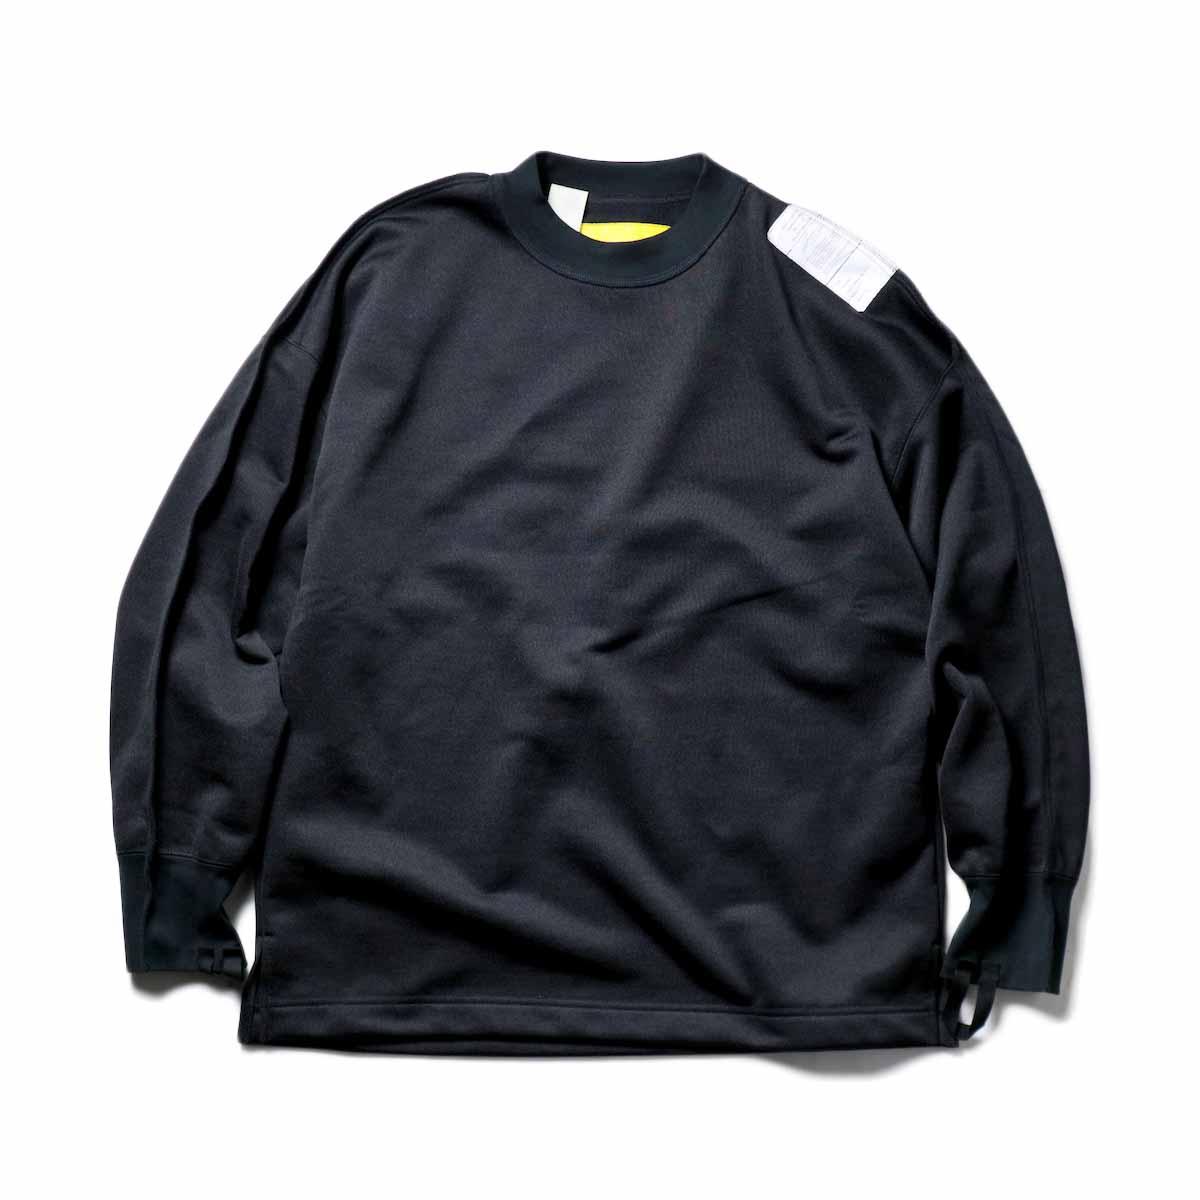 N.HOOLYWOOD / 9211-CS08-024pieces Crew Neck Sweat Shirt (Black)